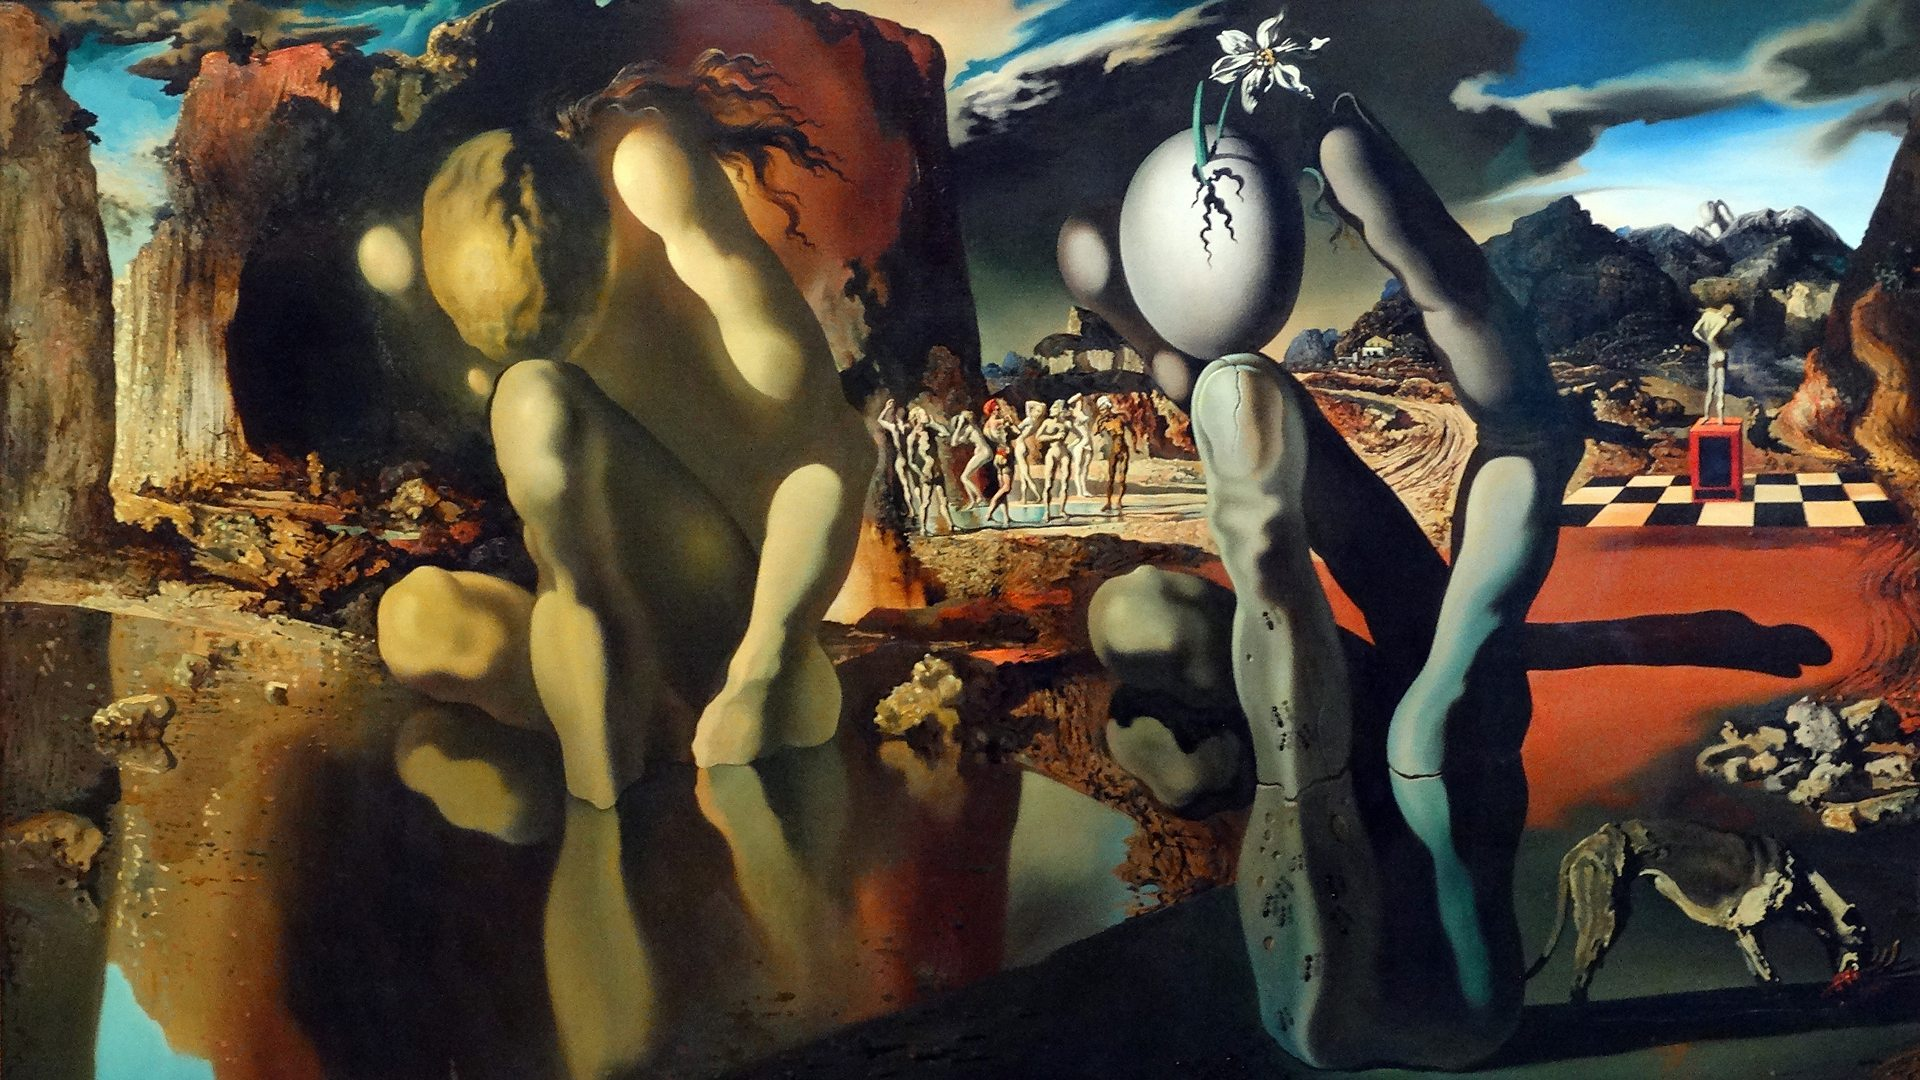 Salvador Dalí,  Metamorphosis of Narcissus , 1937, Tate Modern, London.